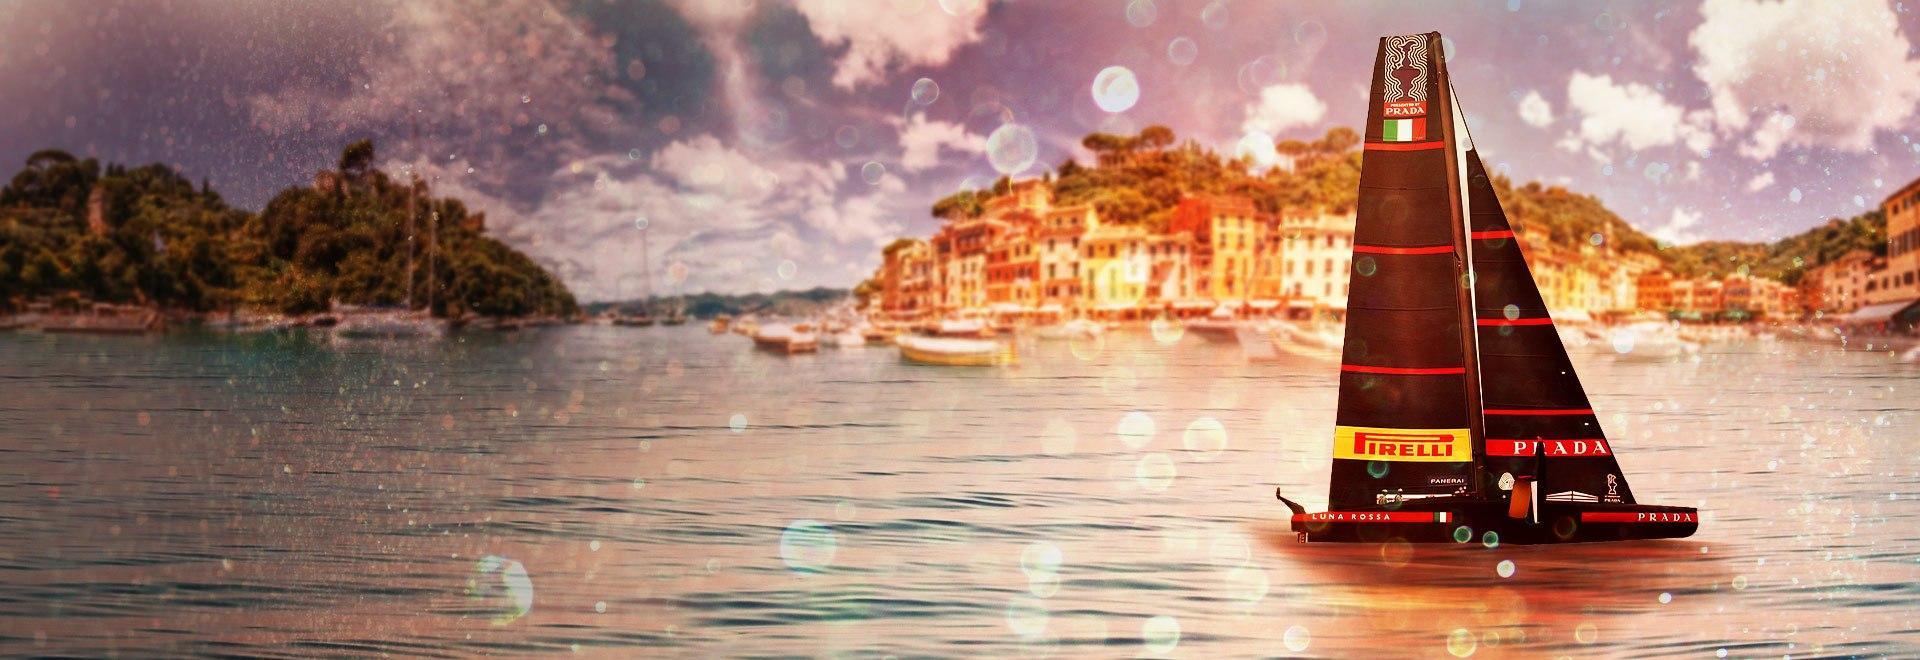 Luna Rossa a Portofino